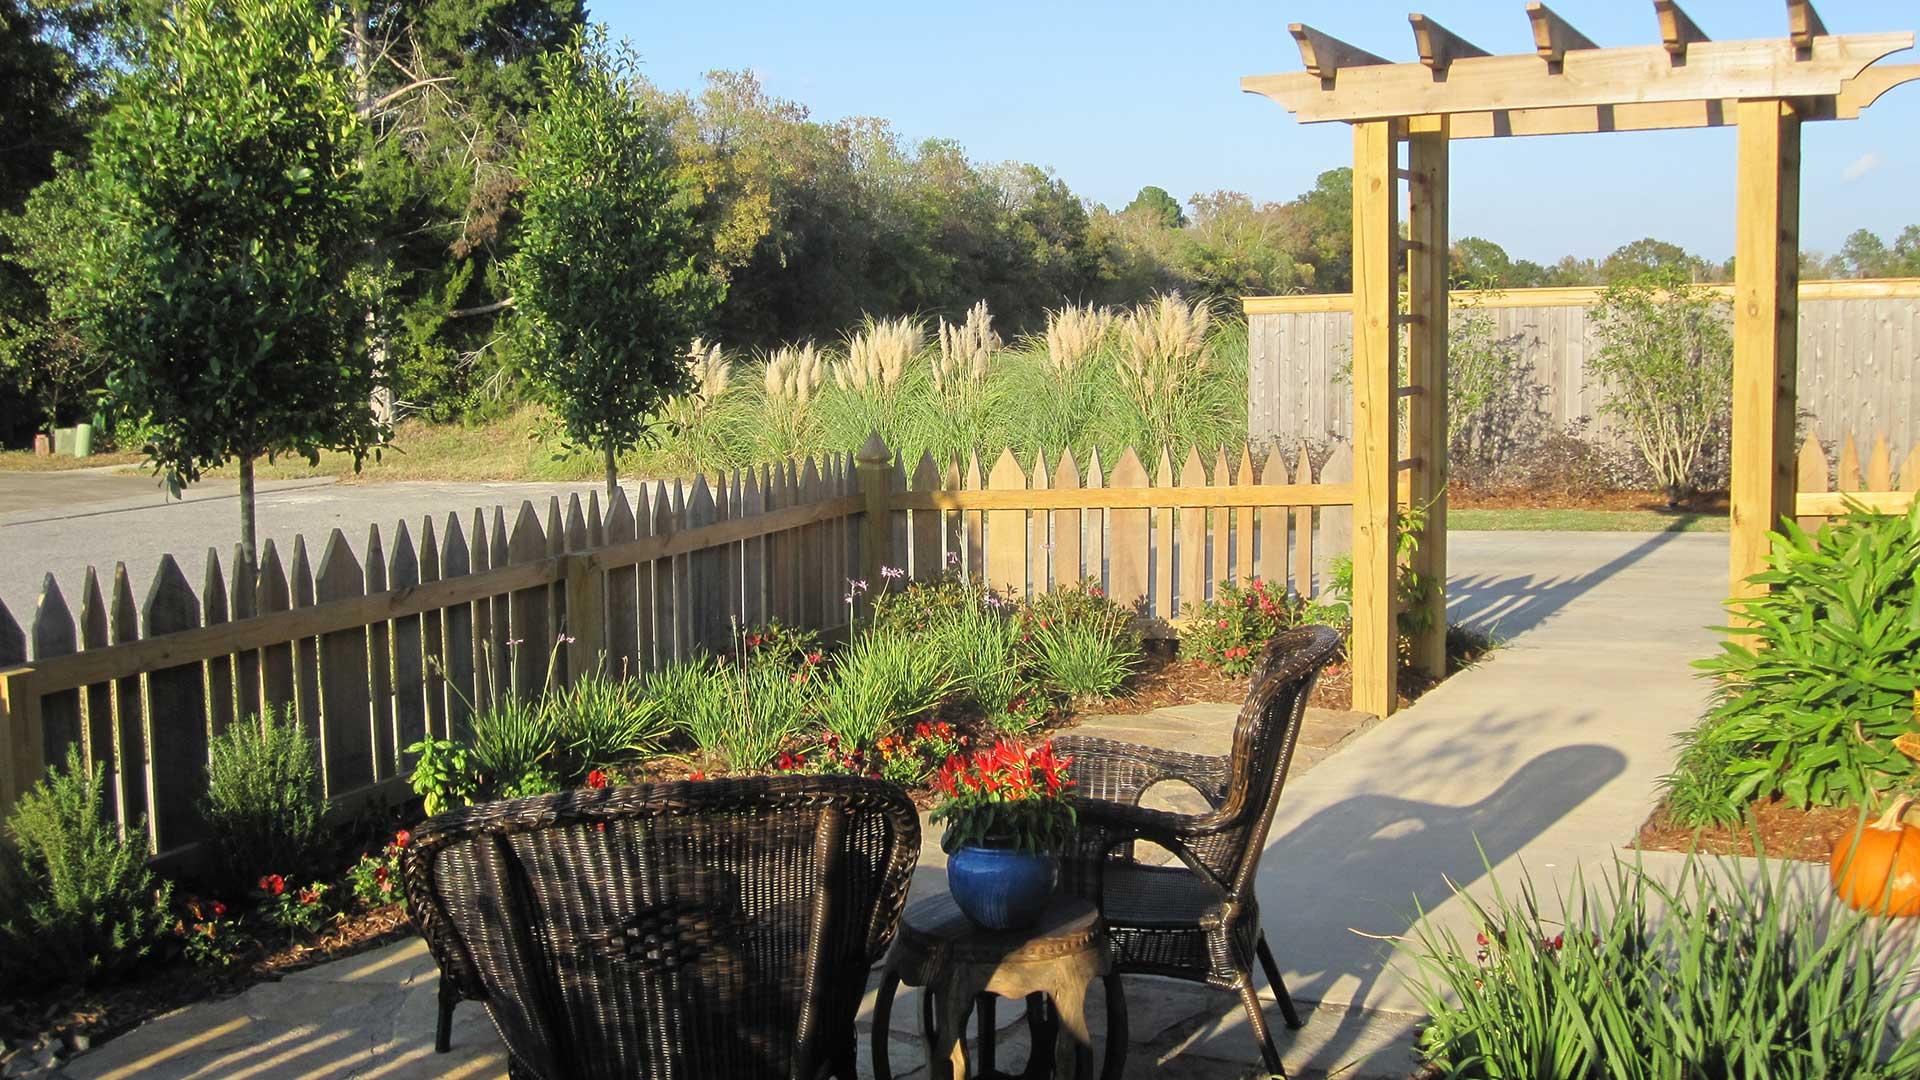 Southern Landscapes Landscape Contractor, Landscape Design and Lawn Care slide 2